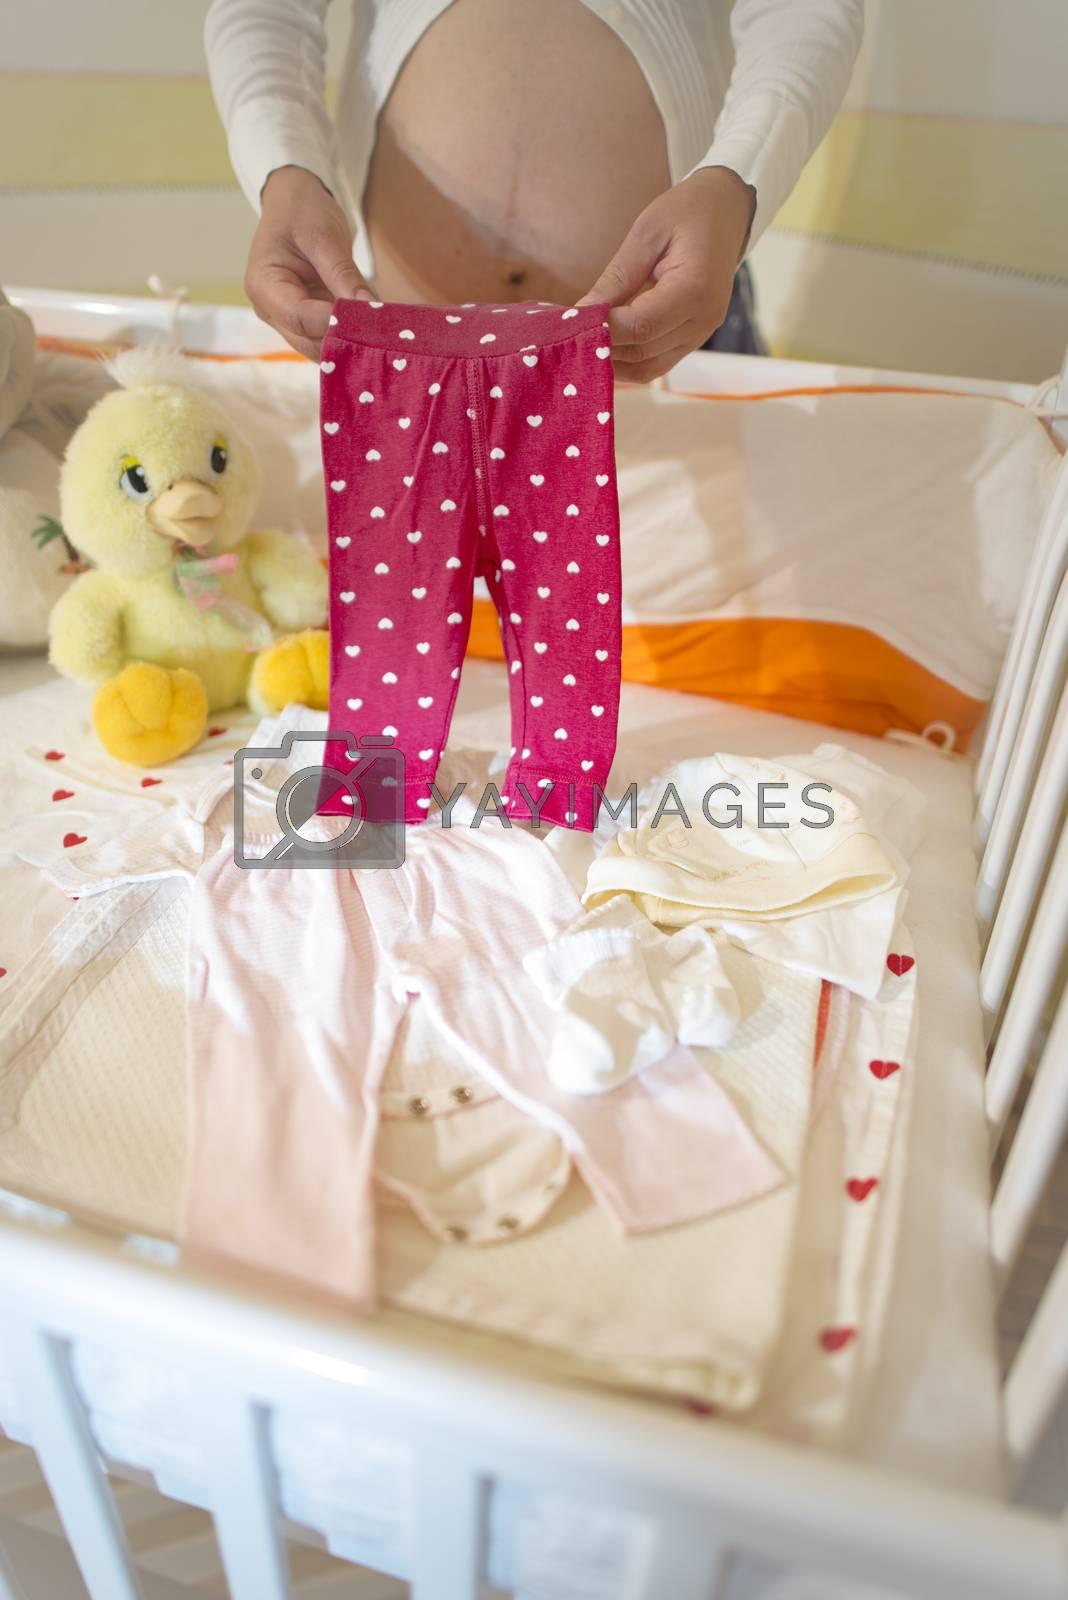 Pregnant women in a baby room. by deyan_georgiev